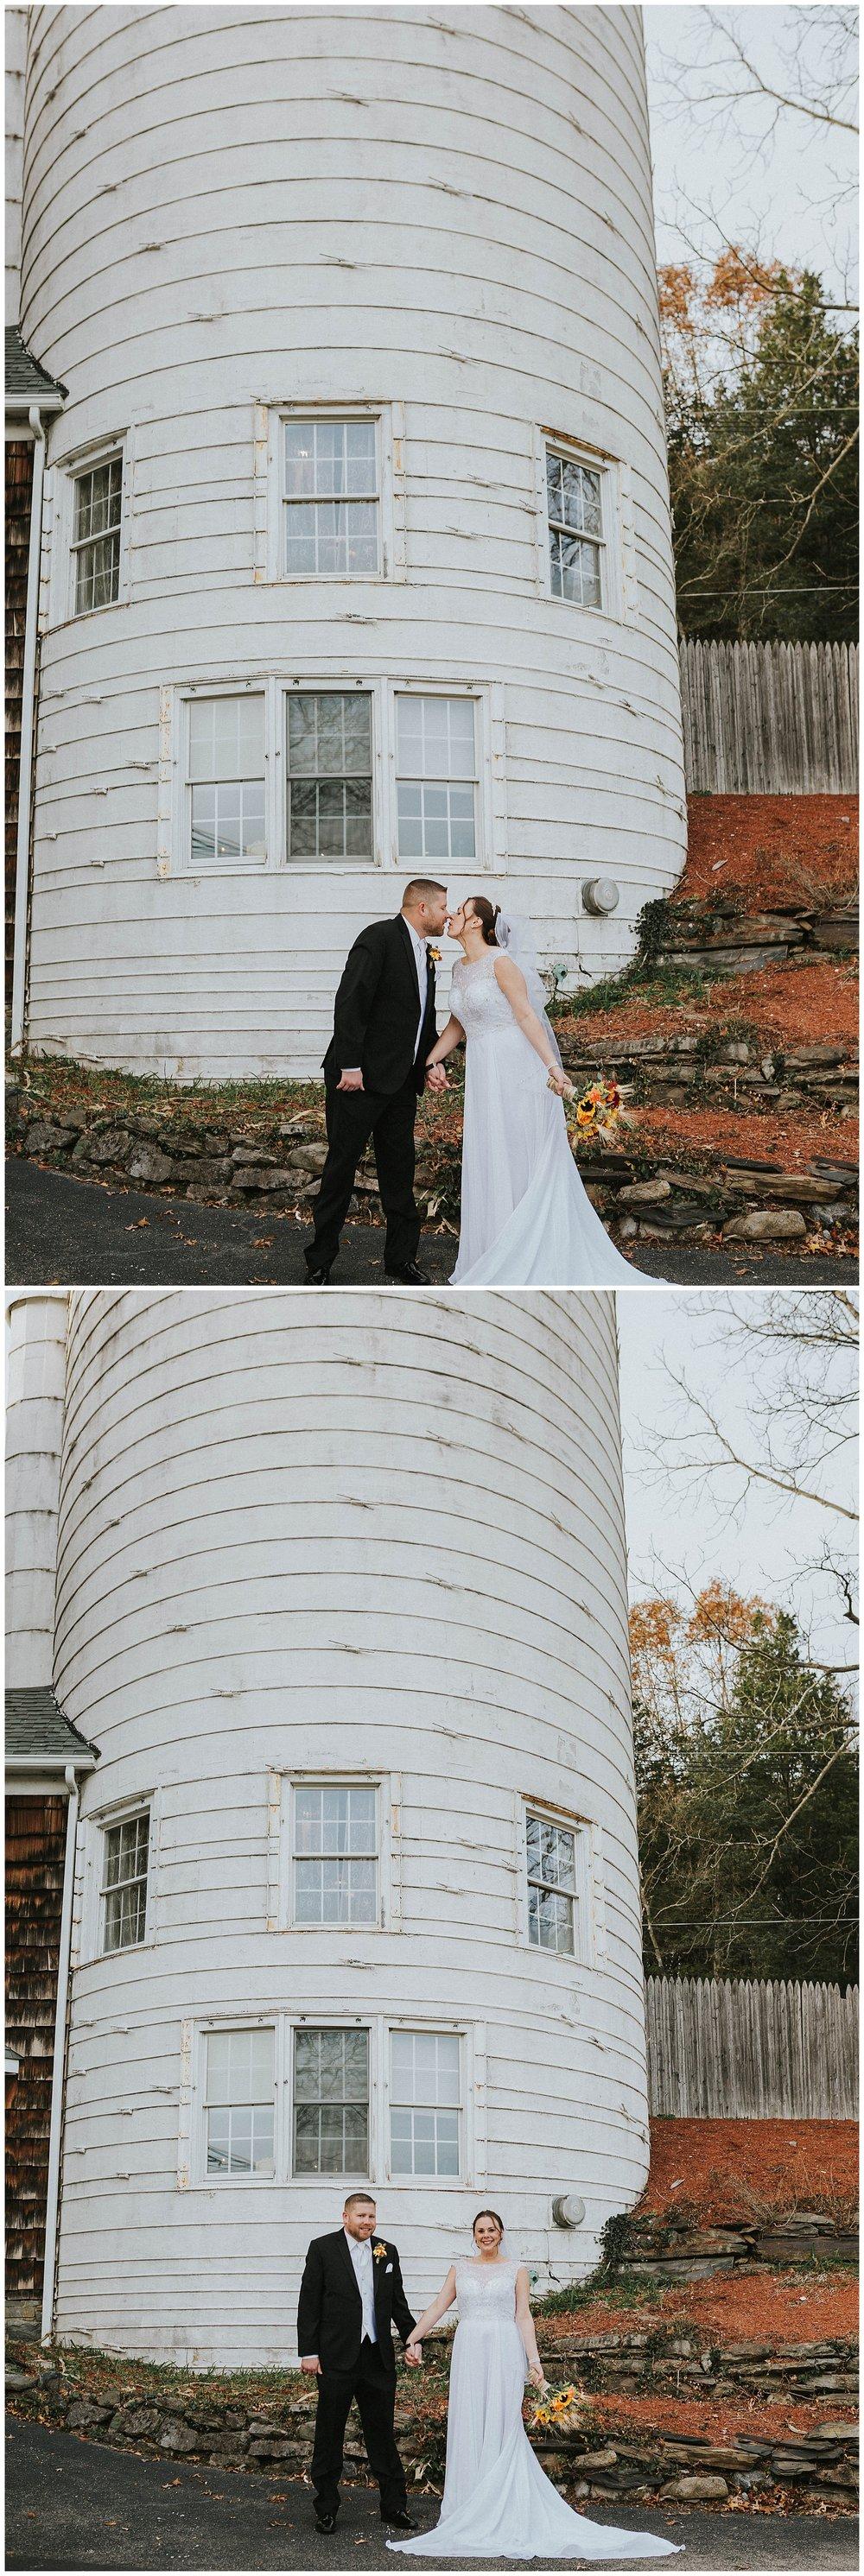 Winter Wedding at Fox Hollow Golf Club in Branchburg New Jersey_0086.jpg